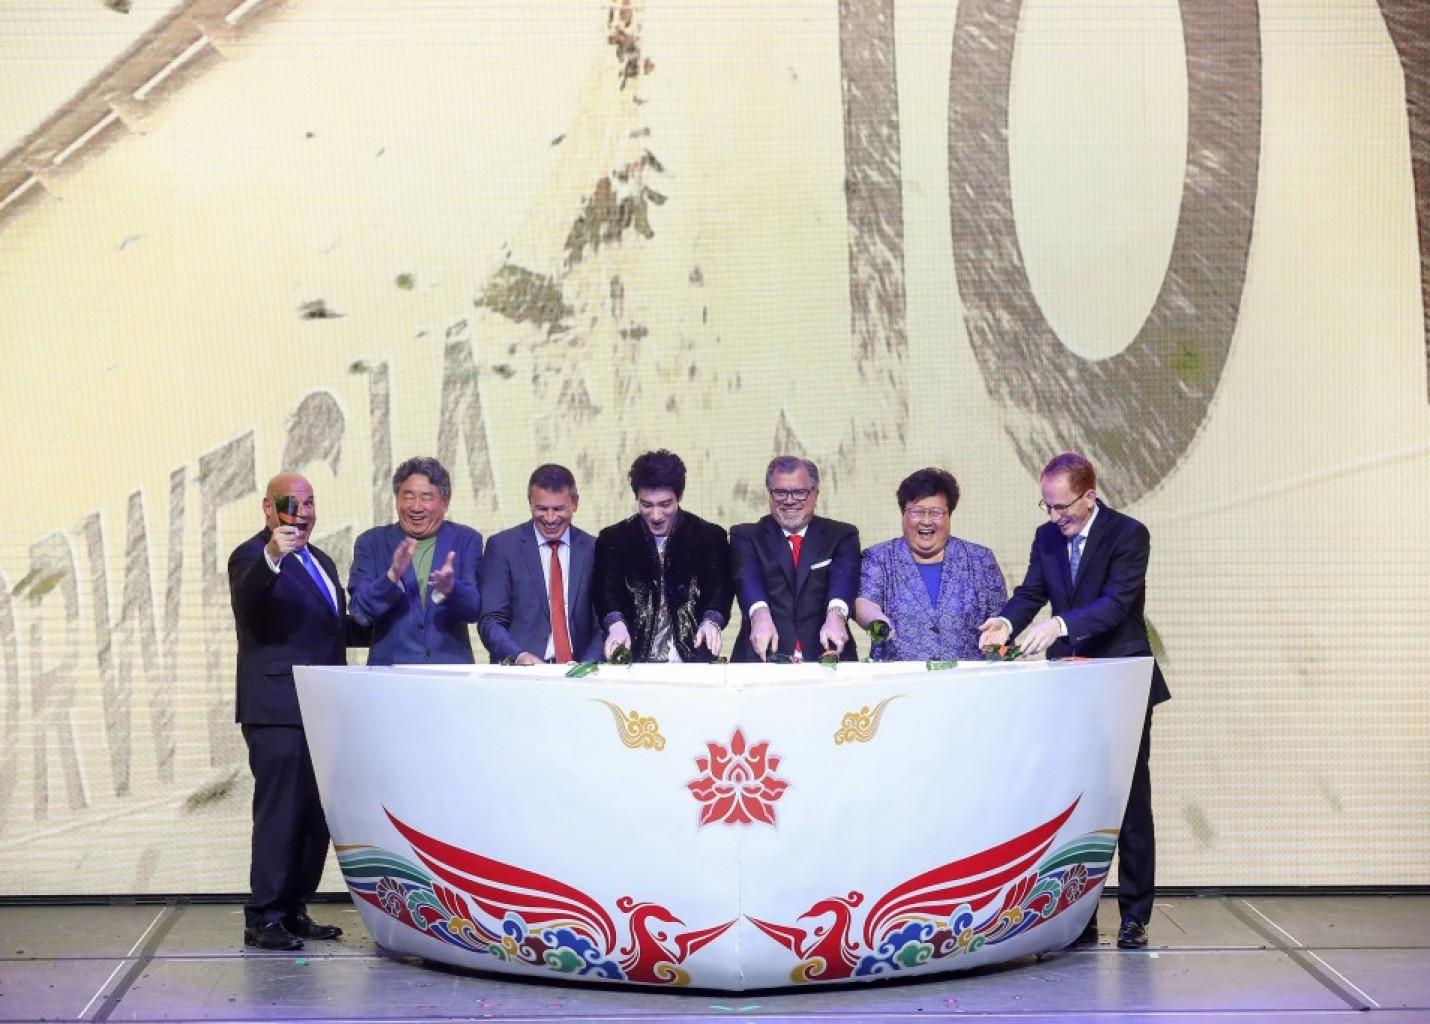 NCL batiza Norwegian Joy em cerimônia luxuosa na China